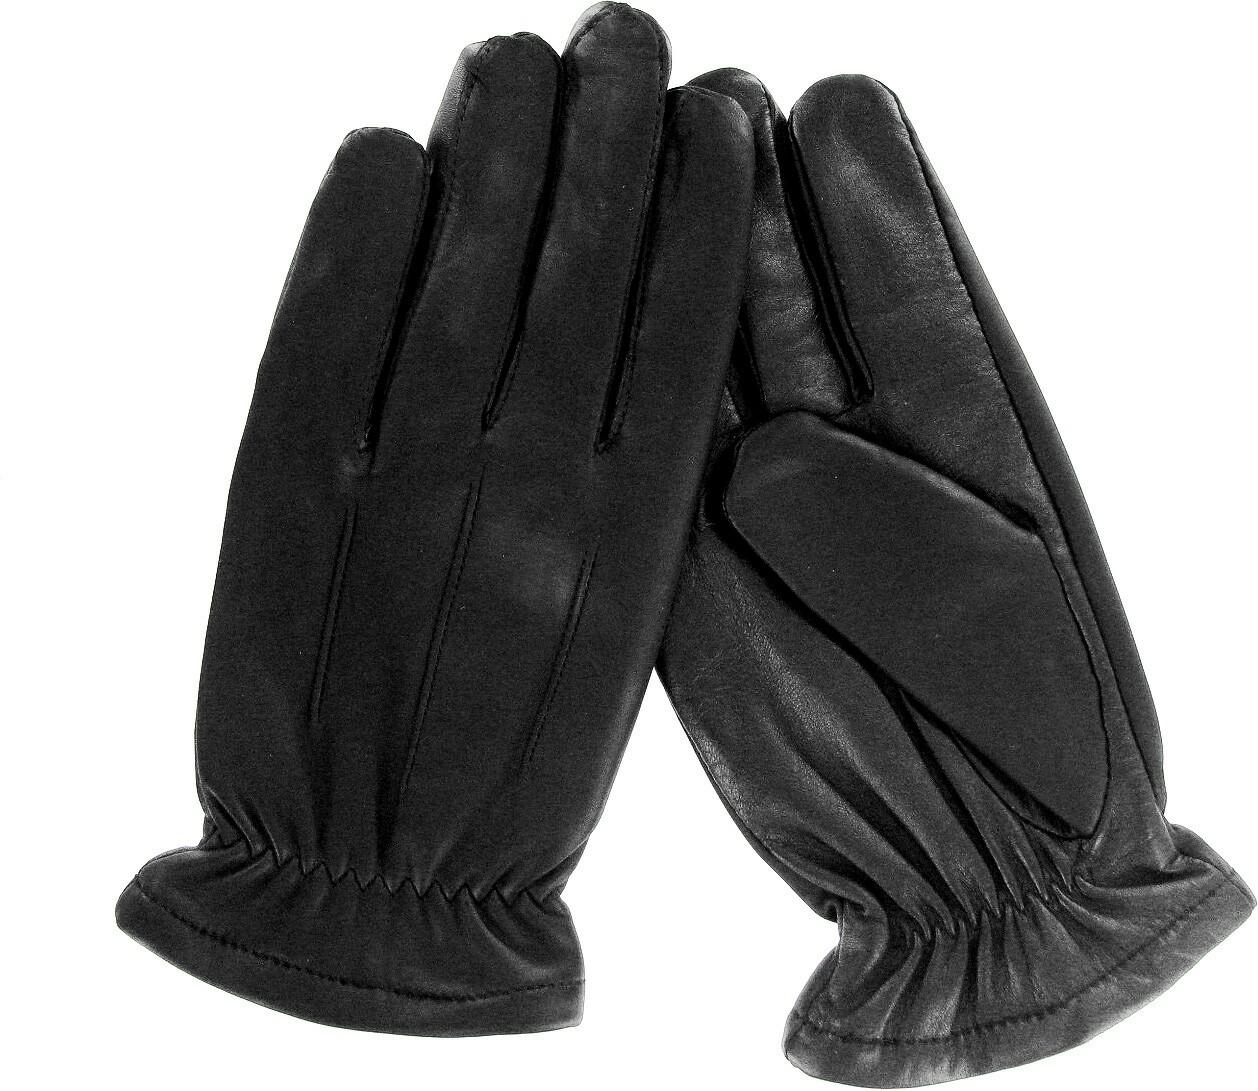 Black usher gloves - The Glove Guru